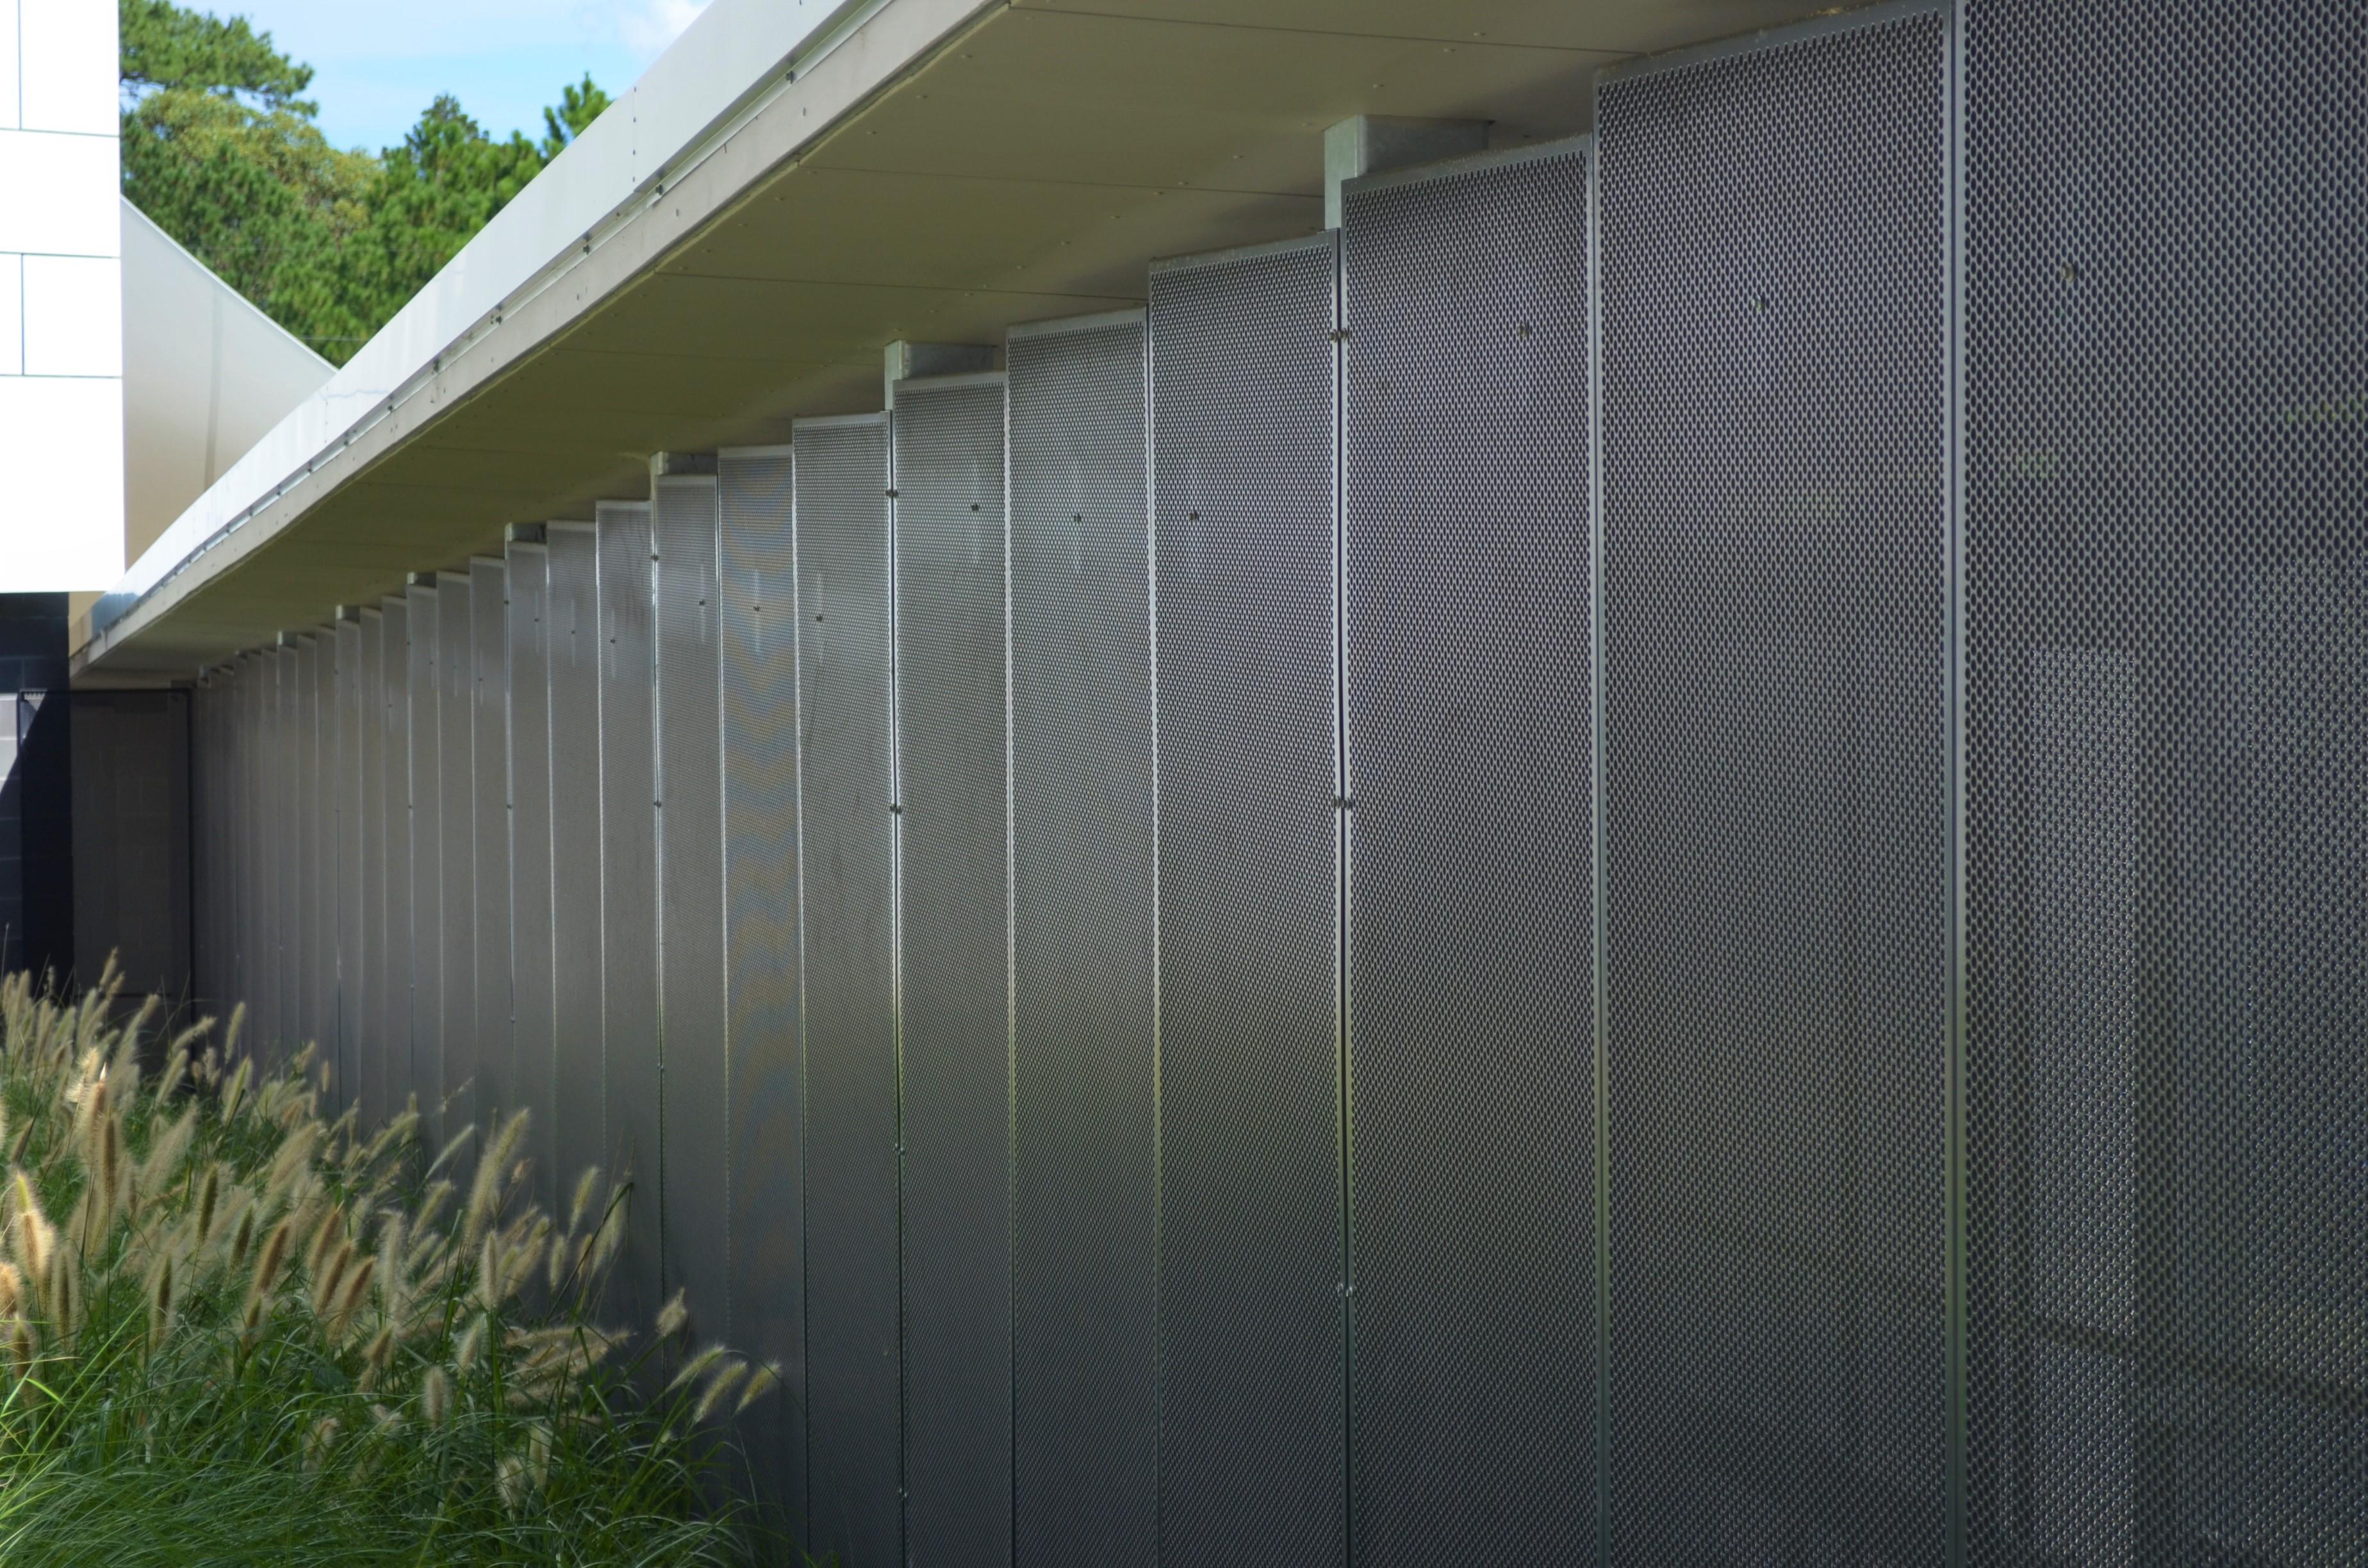 Perforated metal walkway panels - gosford hospital